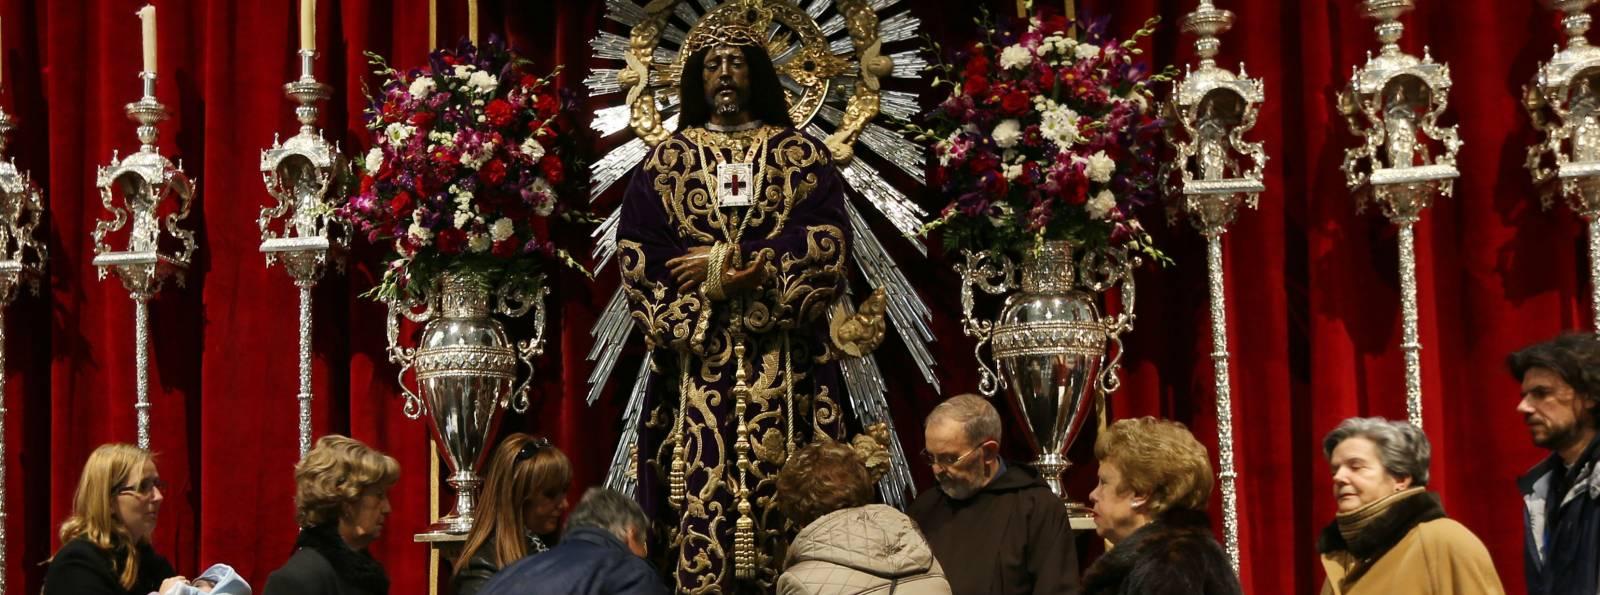 Fieles tocan los pies del Cristo de Medinaceli. Foto Ernesto Agudo